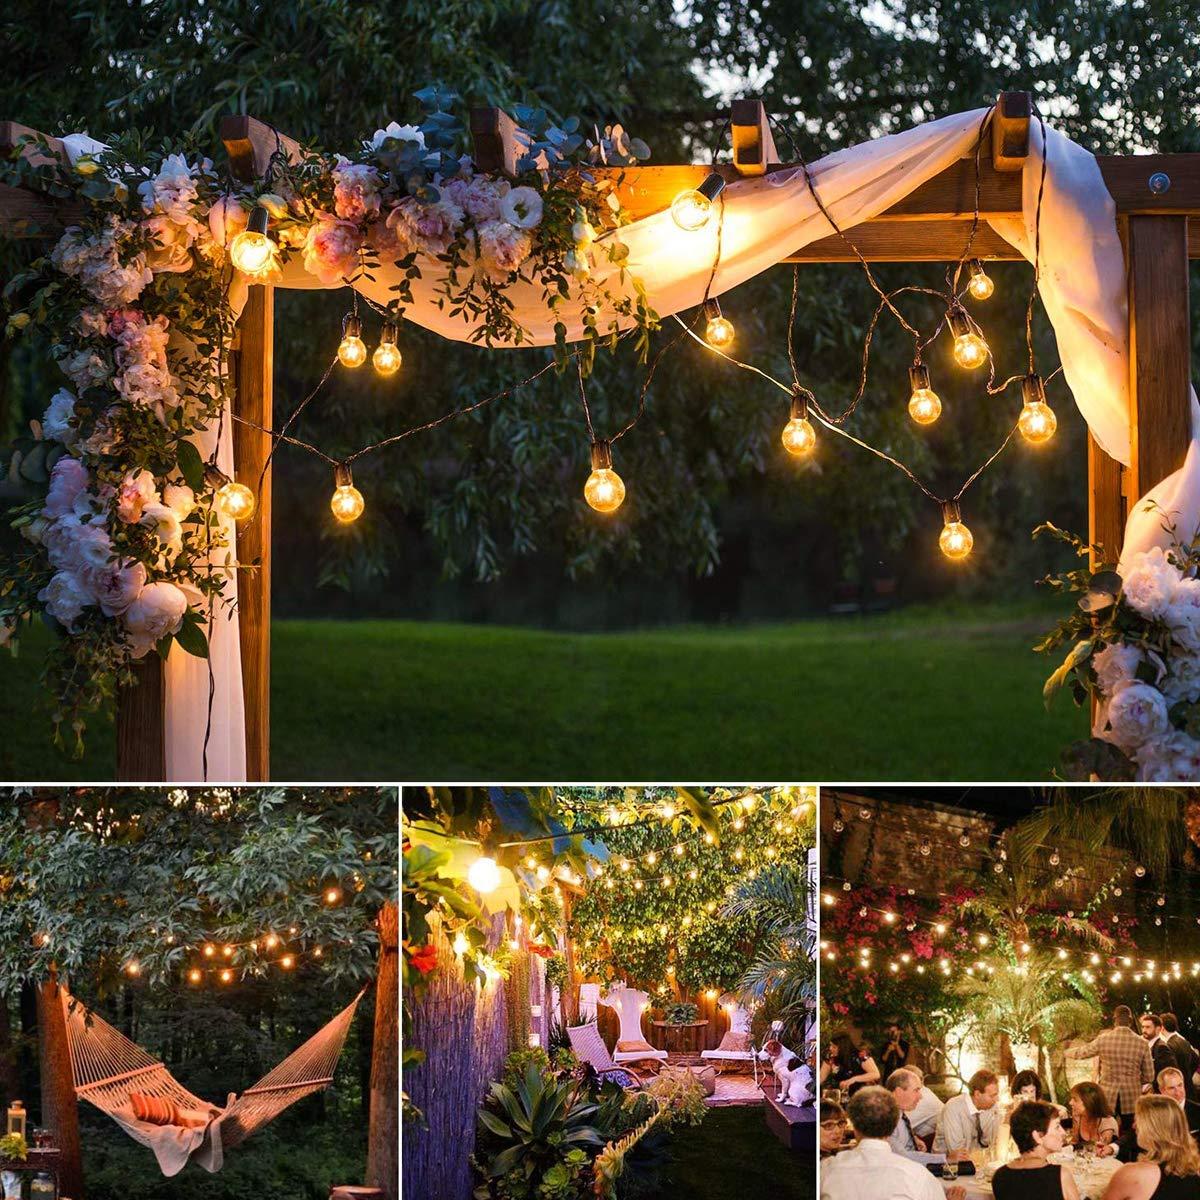 50Bulbs + 4 Spare Bulbs GEEDIAR Outdoor String Lights,50ft G40 Garden Lights Mains Powered Party Lights,Waterproof Outdoor Indoor String Lights for Terrace Patio Xmas Wedding Party Decoration